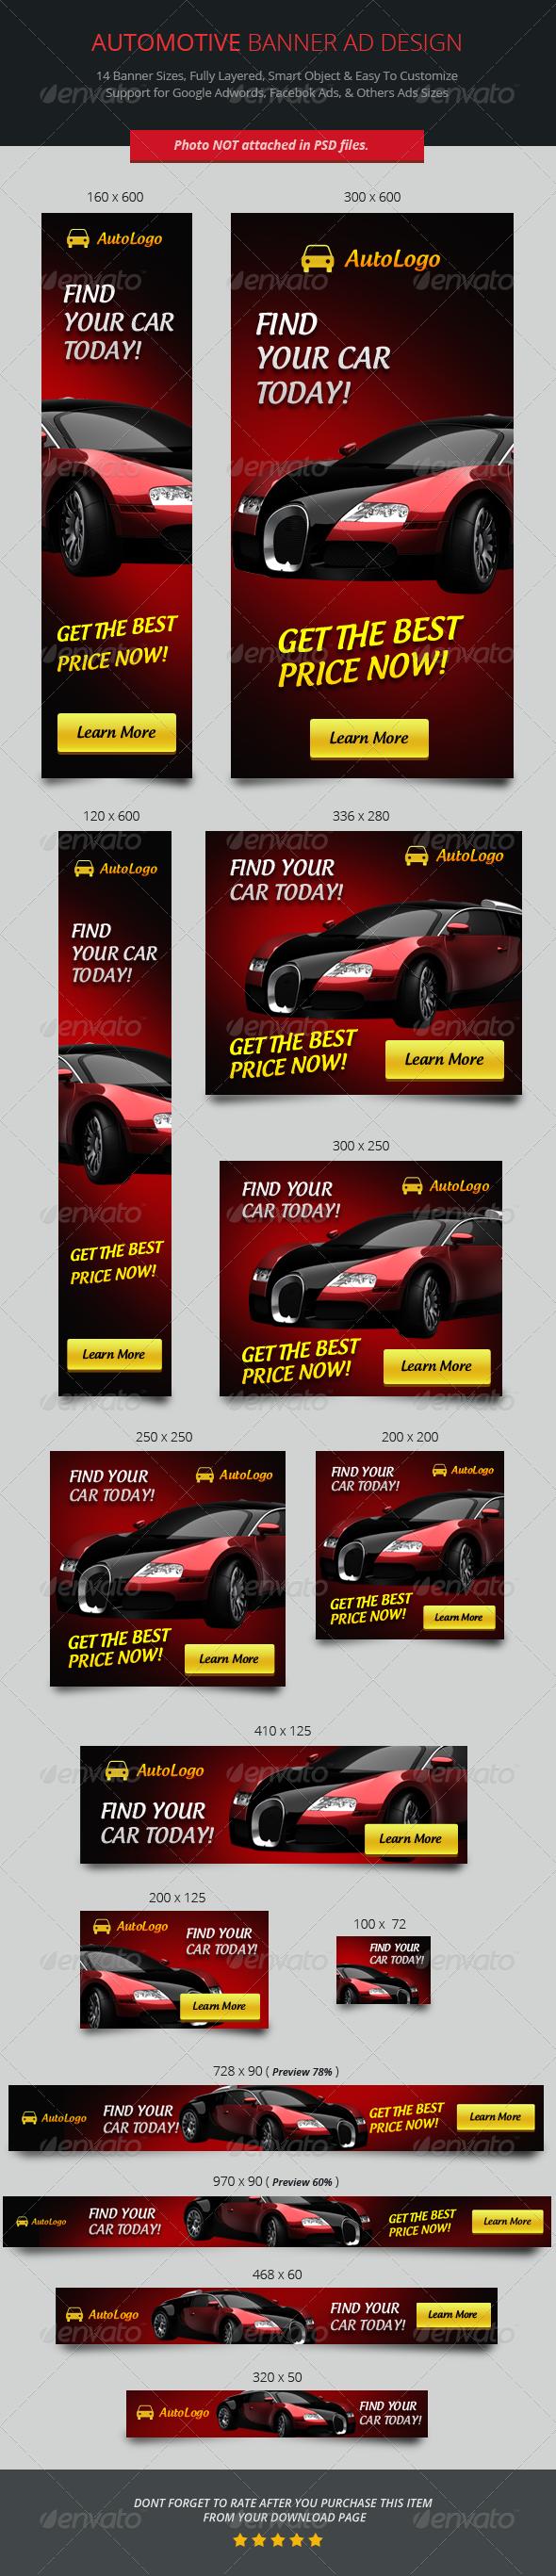 GraphicRiver Automotive Banner ad Design 6973245